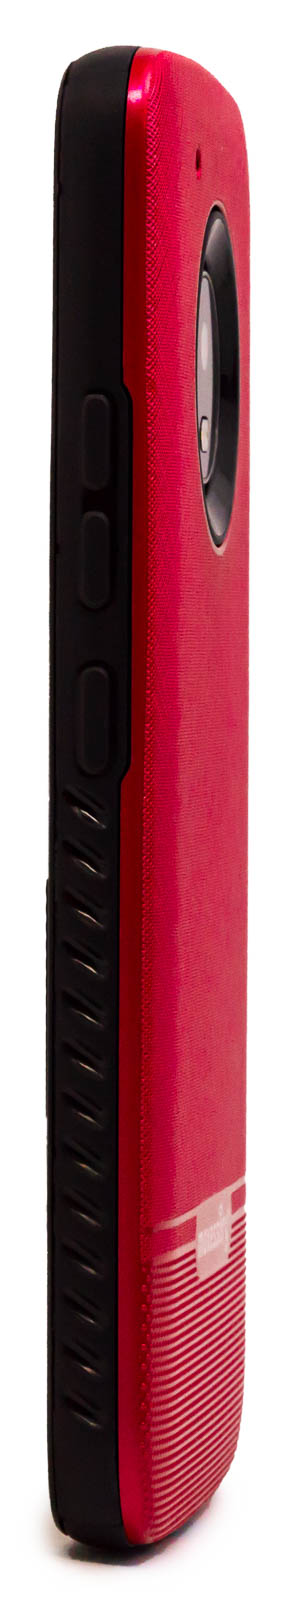 Moto-G5-Plus-Case-Moto-X-17-Case-Ultra-Thin-Hard-Body-Tactile-Shell-Cover thumbnail 33